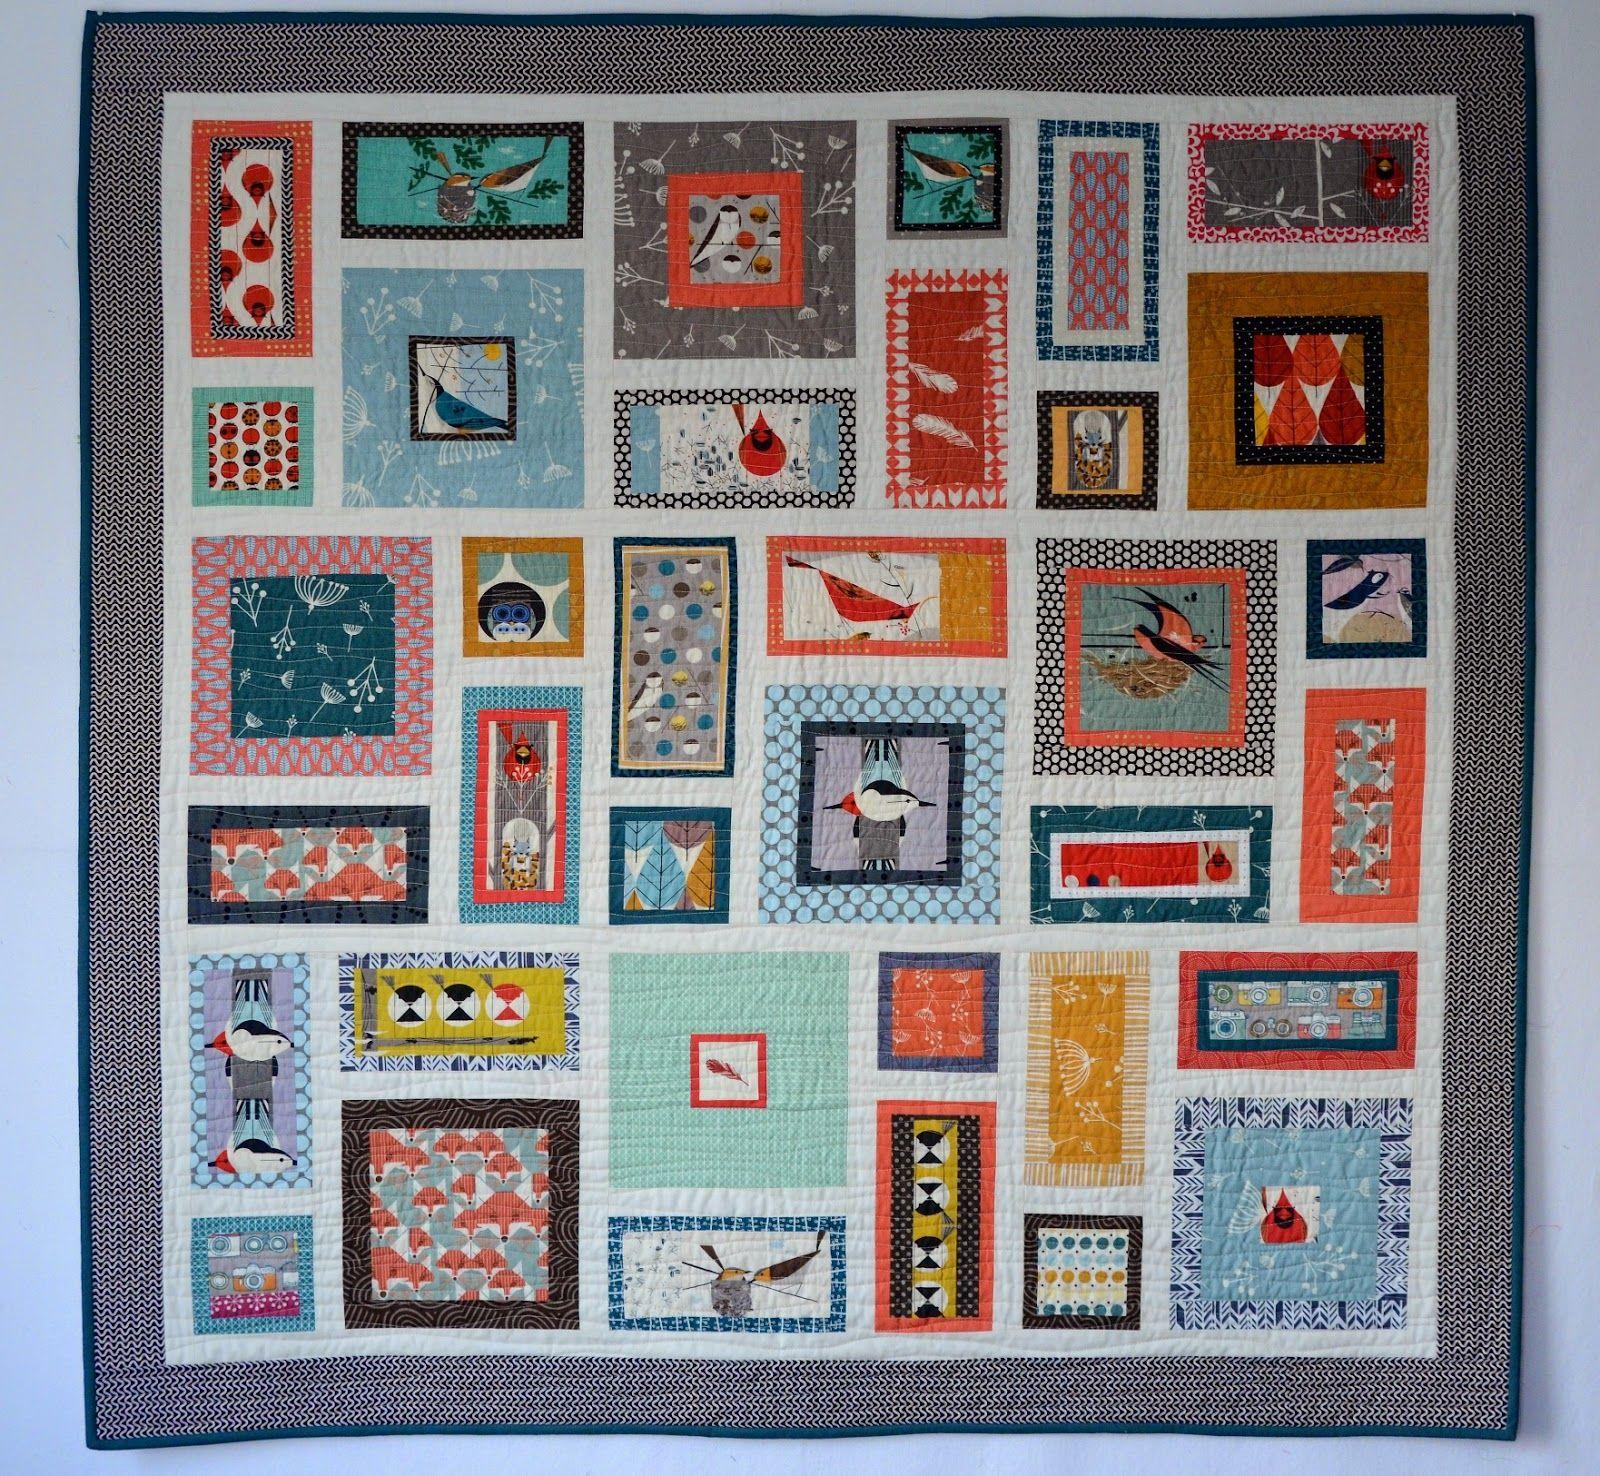 Hyacinth Quilt Designs: Charley Harper Quilt | Quilts We Love ... : hyacinth quilt designs - Adamdwight.com